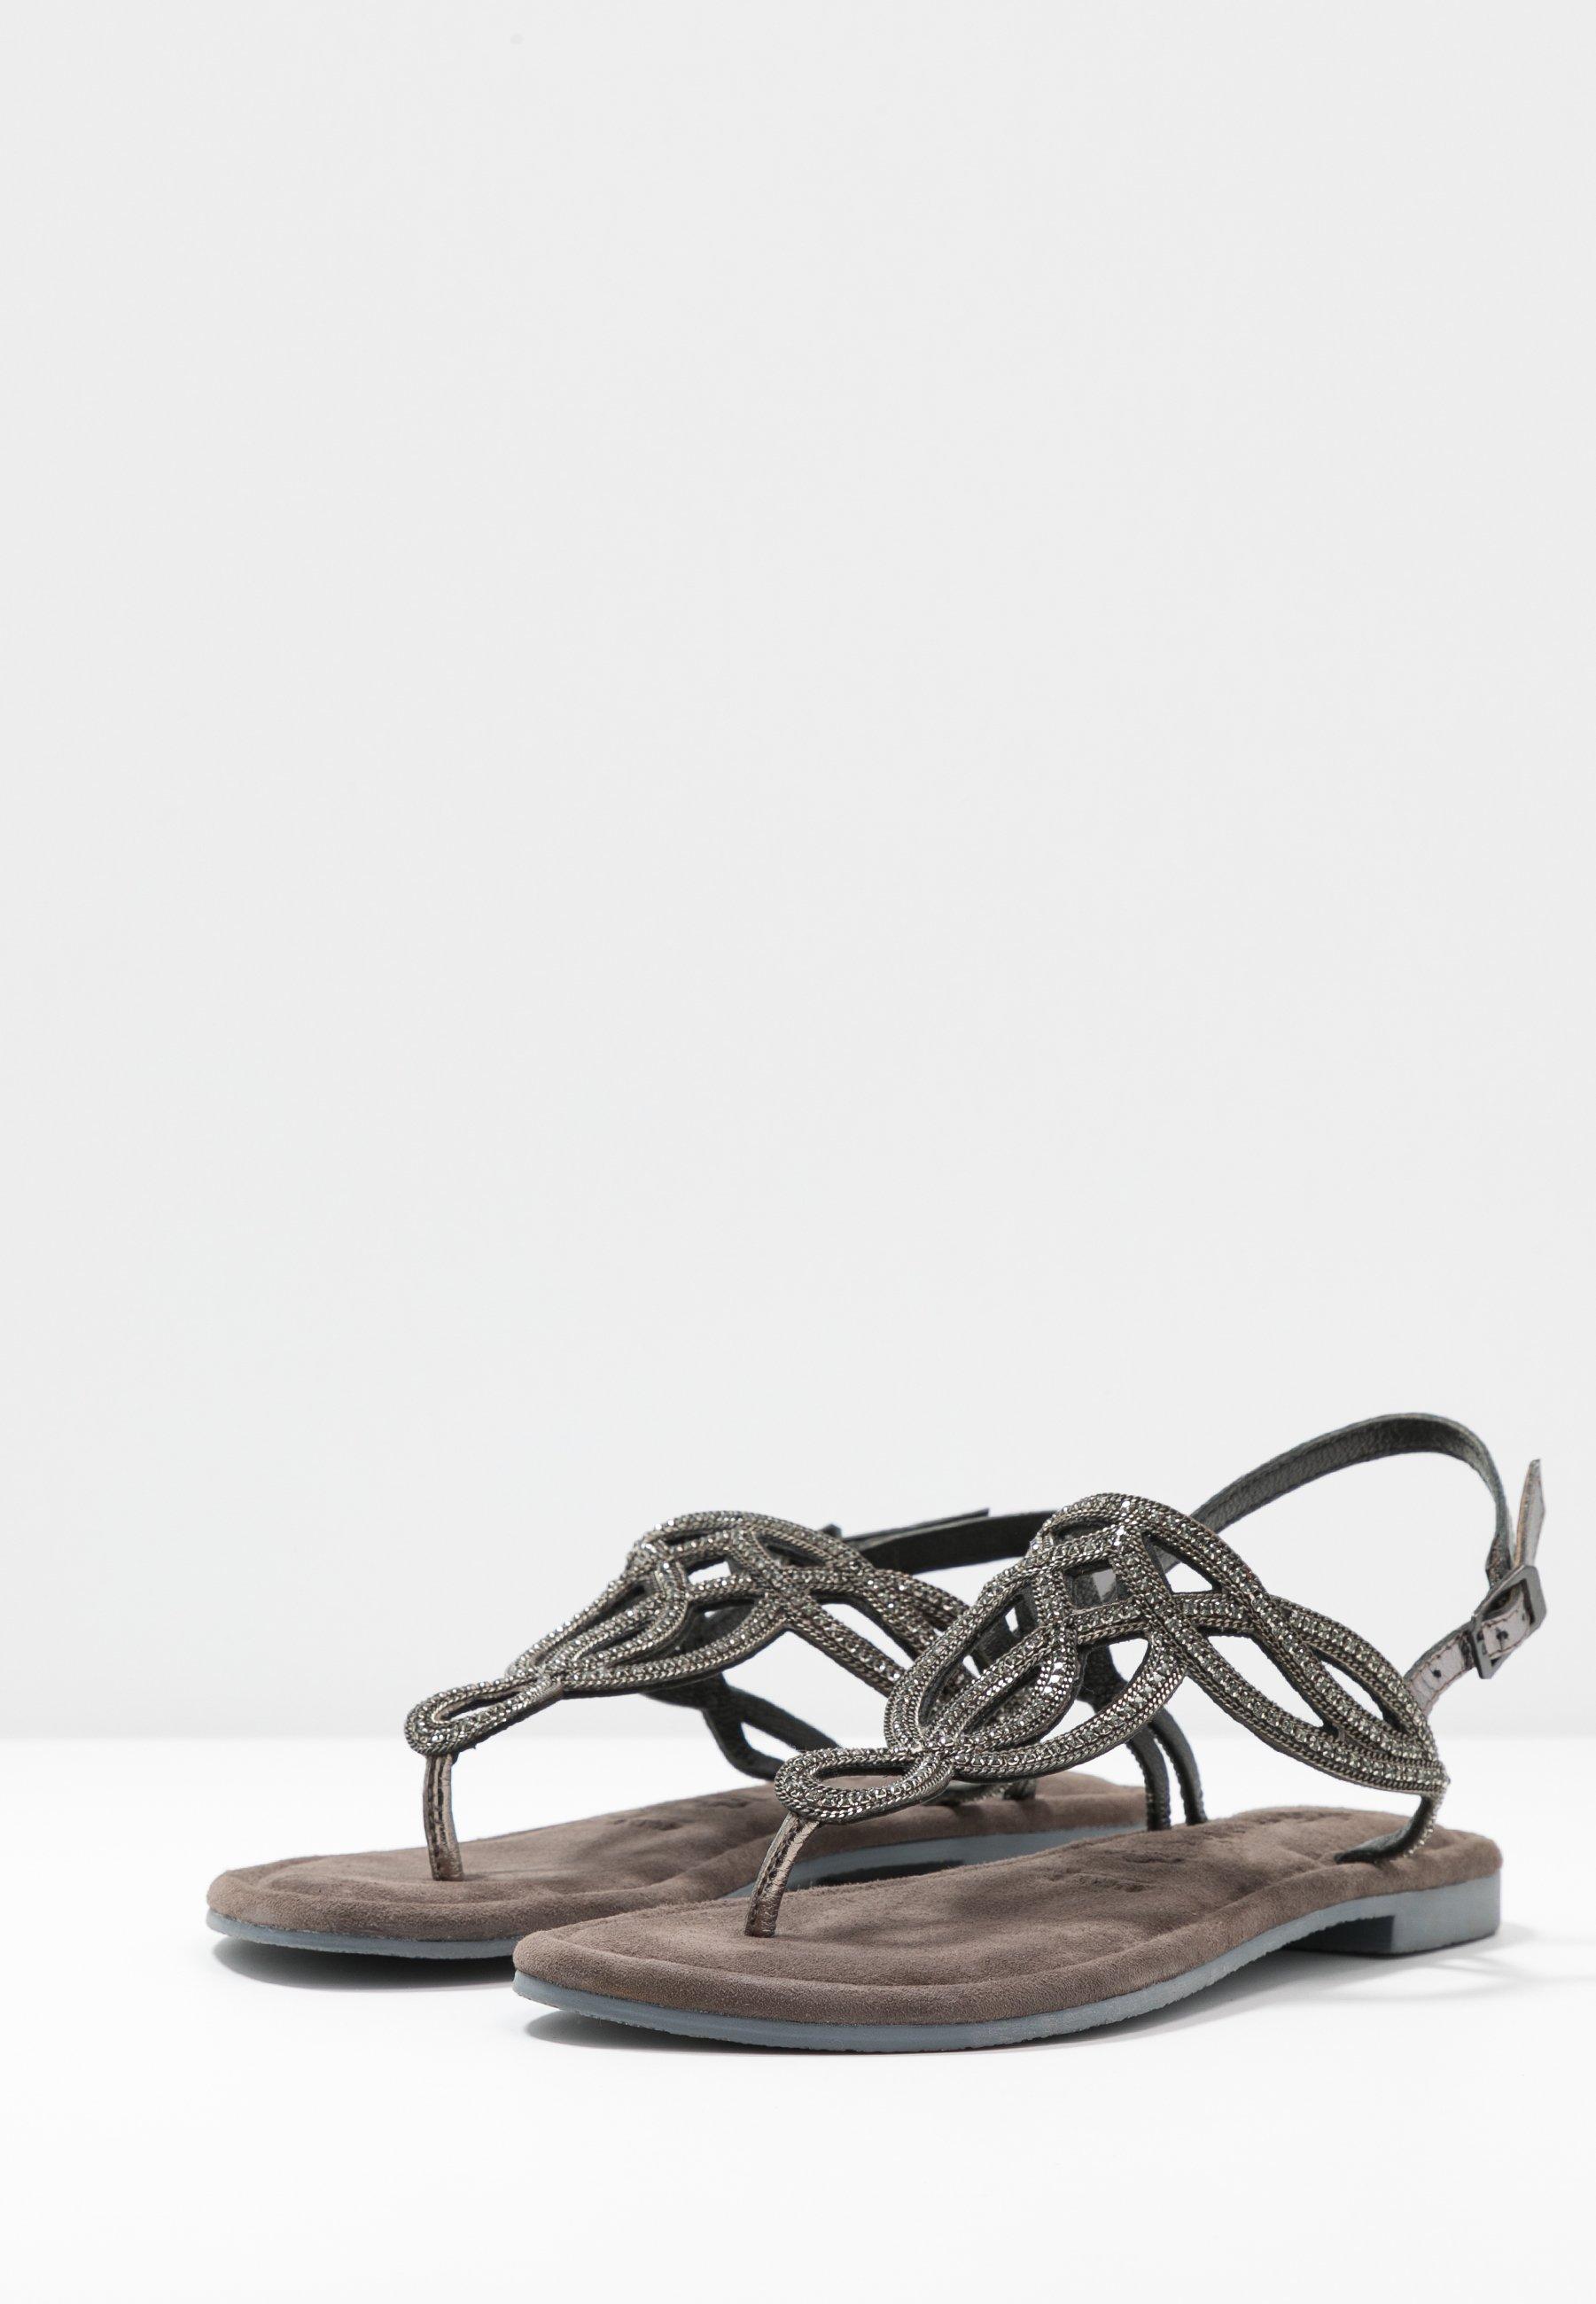 Tamaris T-bar sandals - black metallic